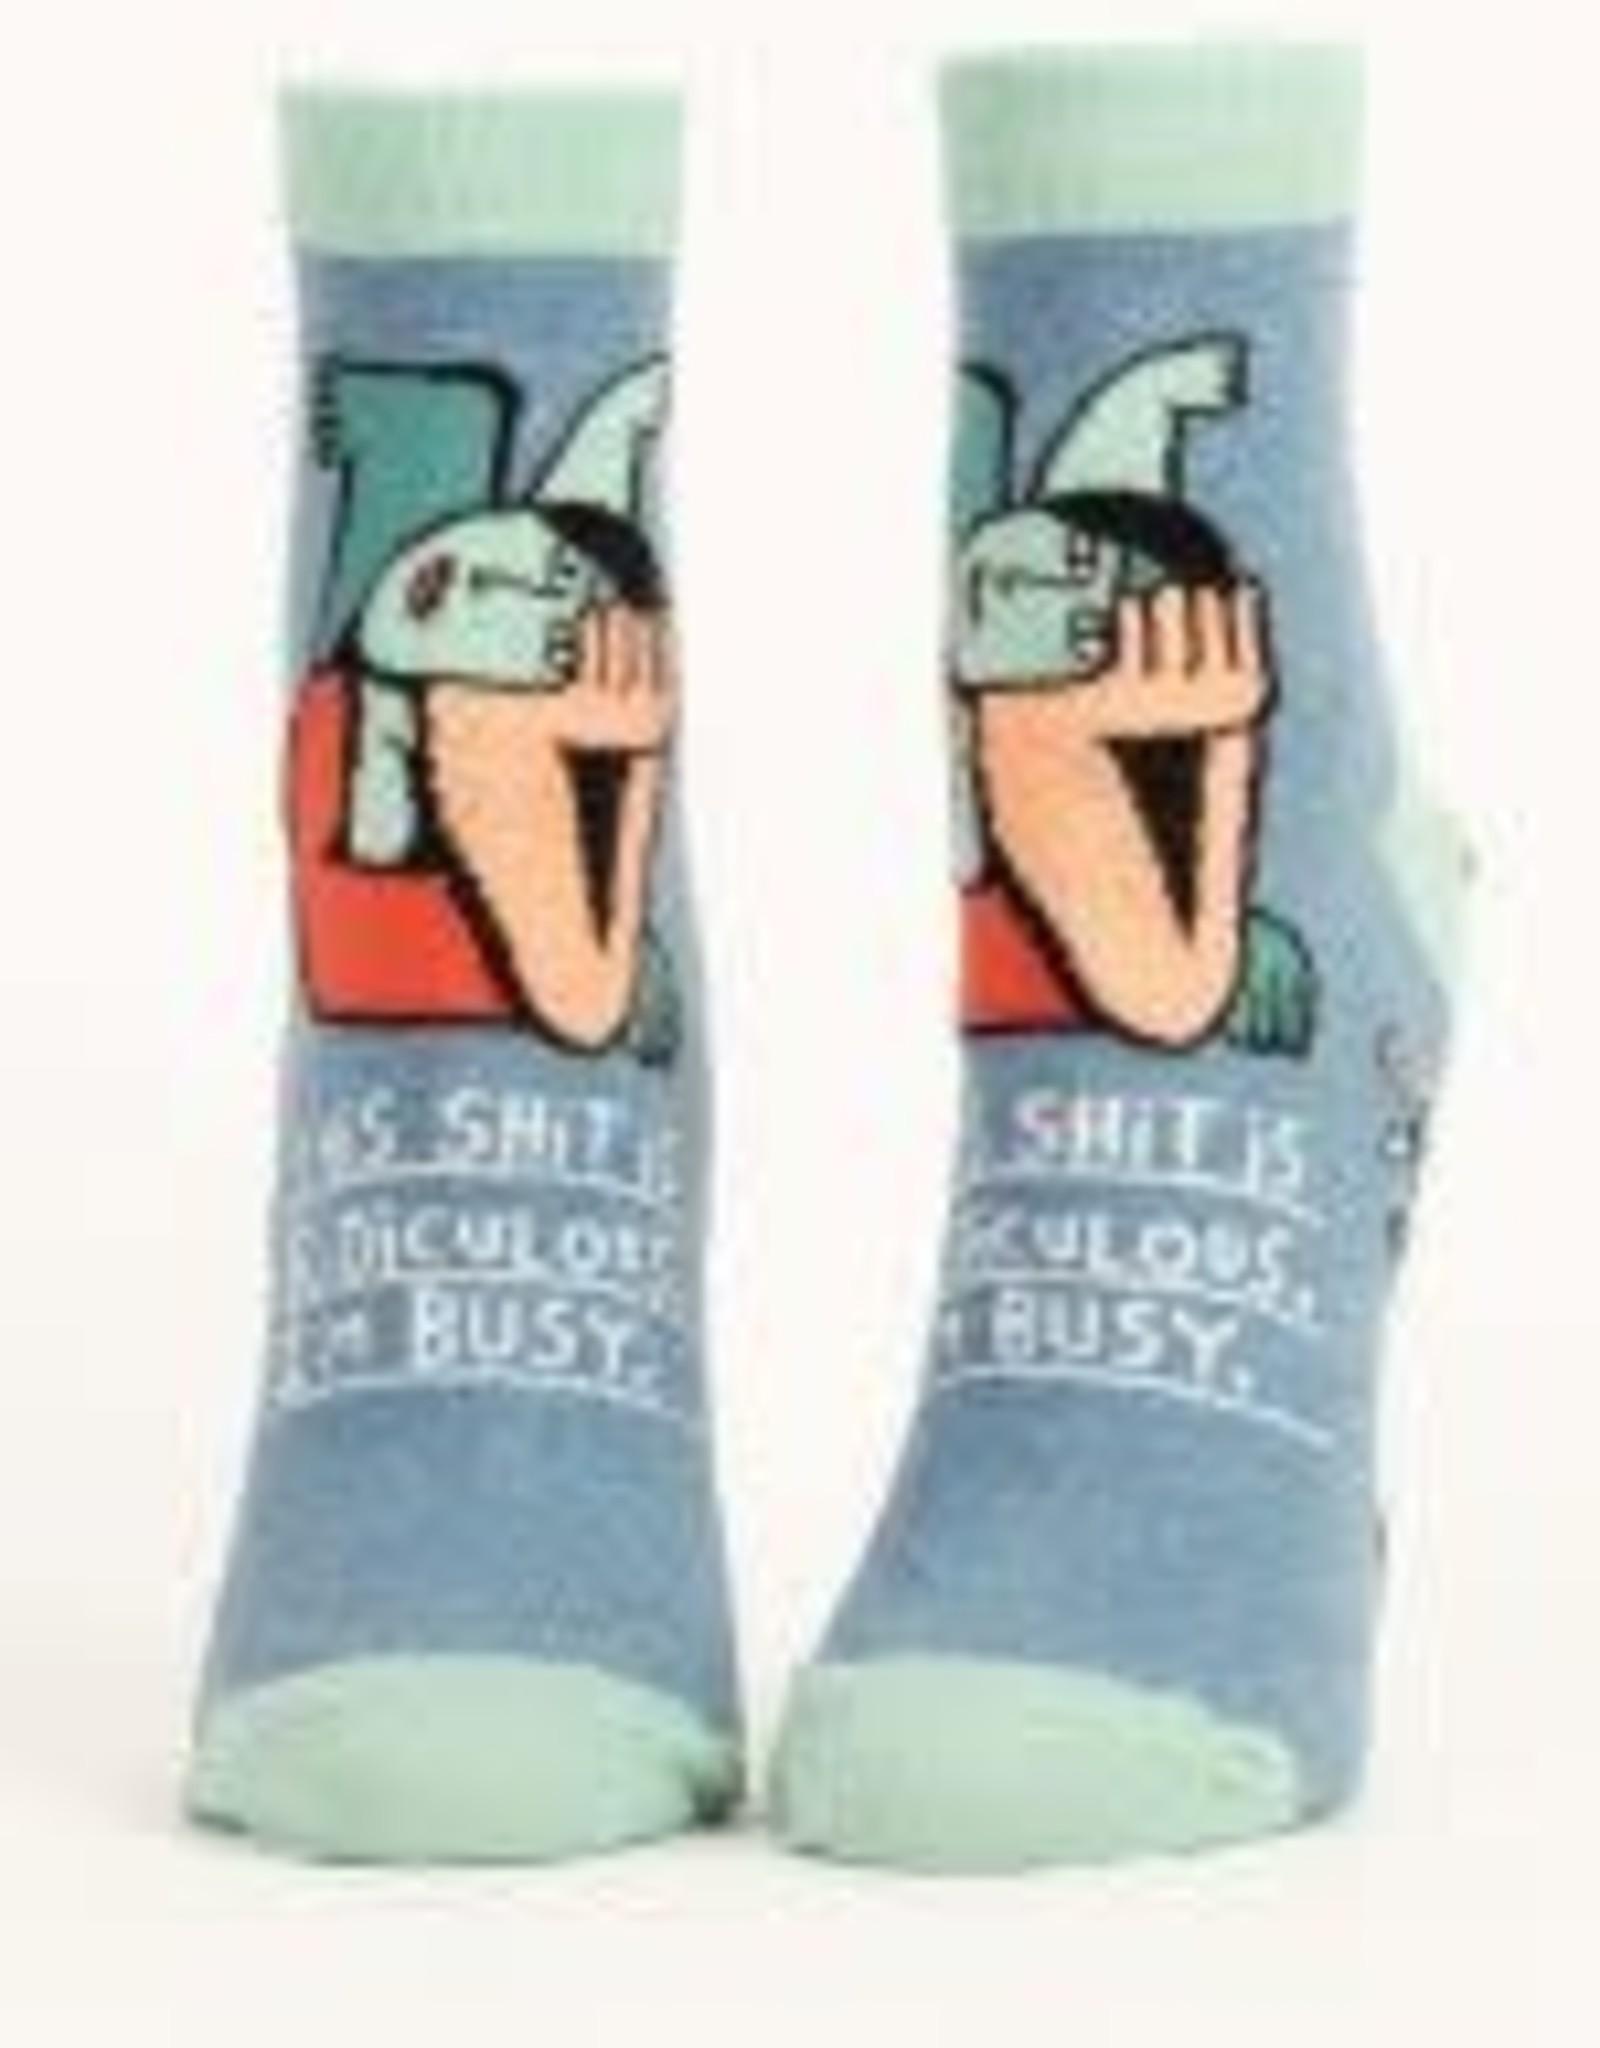 Blue Q Blue Q Women's Ankle Socks Shit is Ridiculous